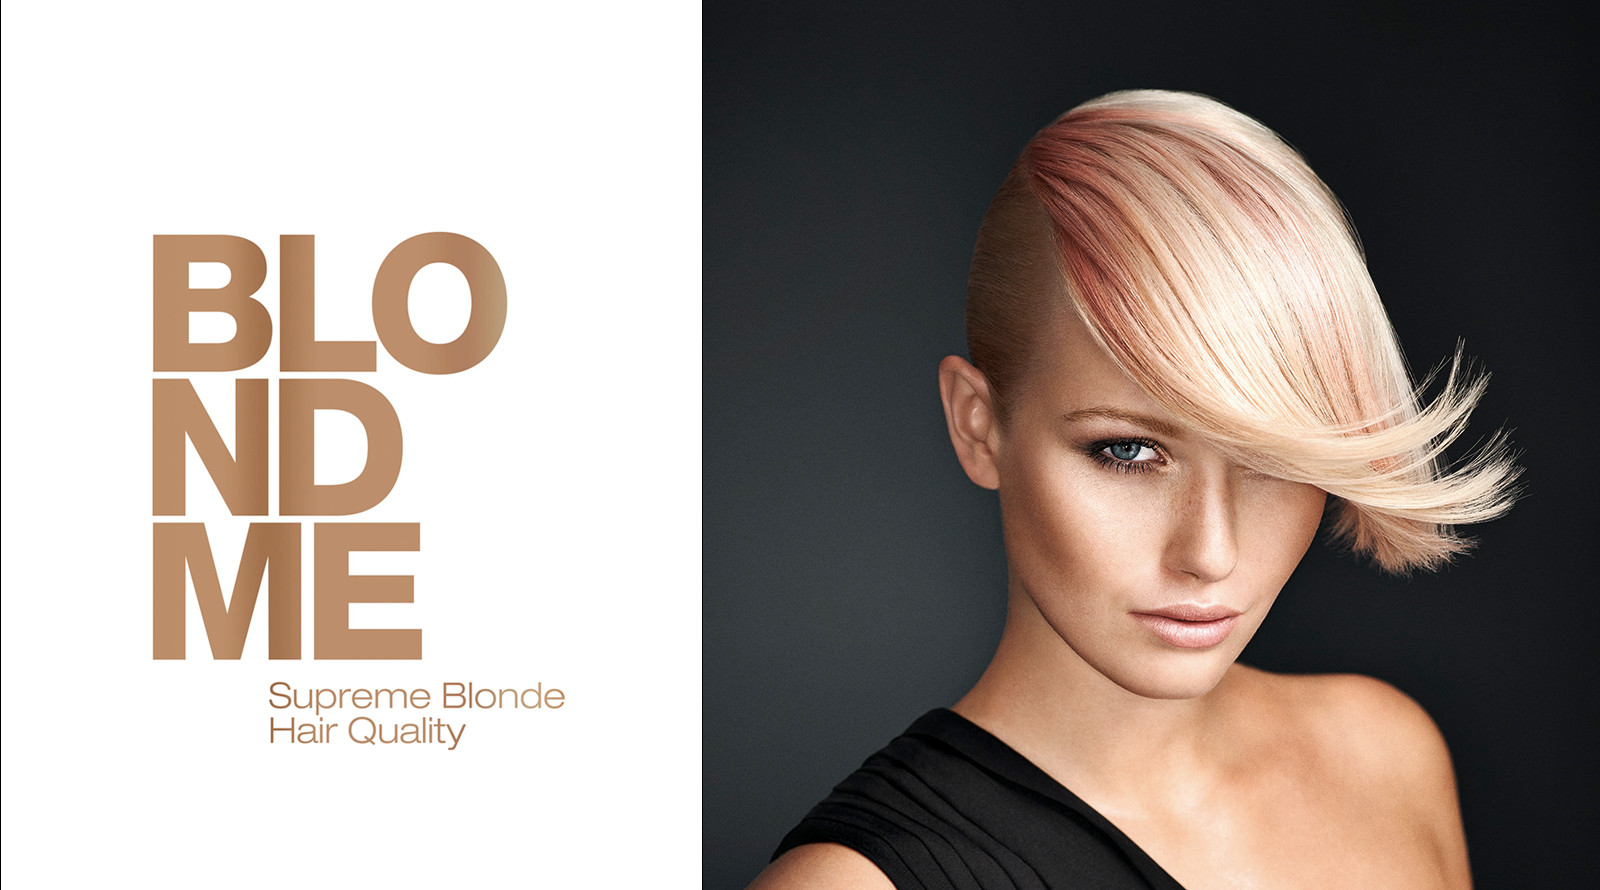 blondemepp